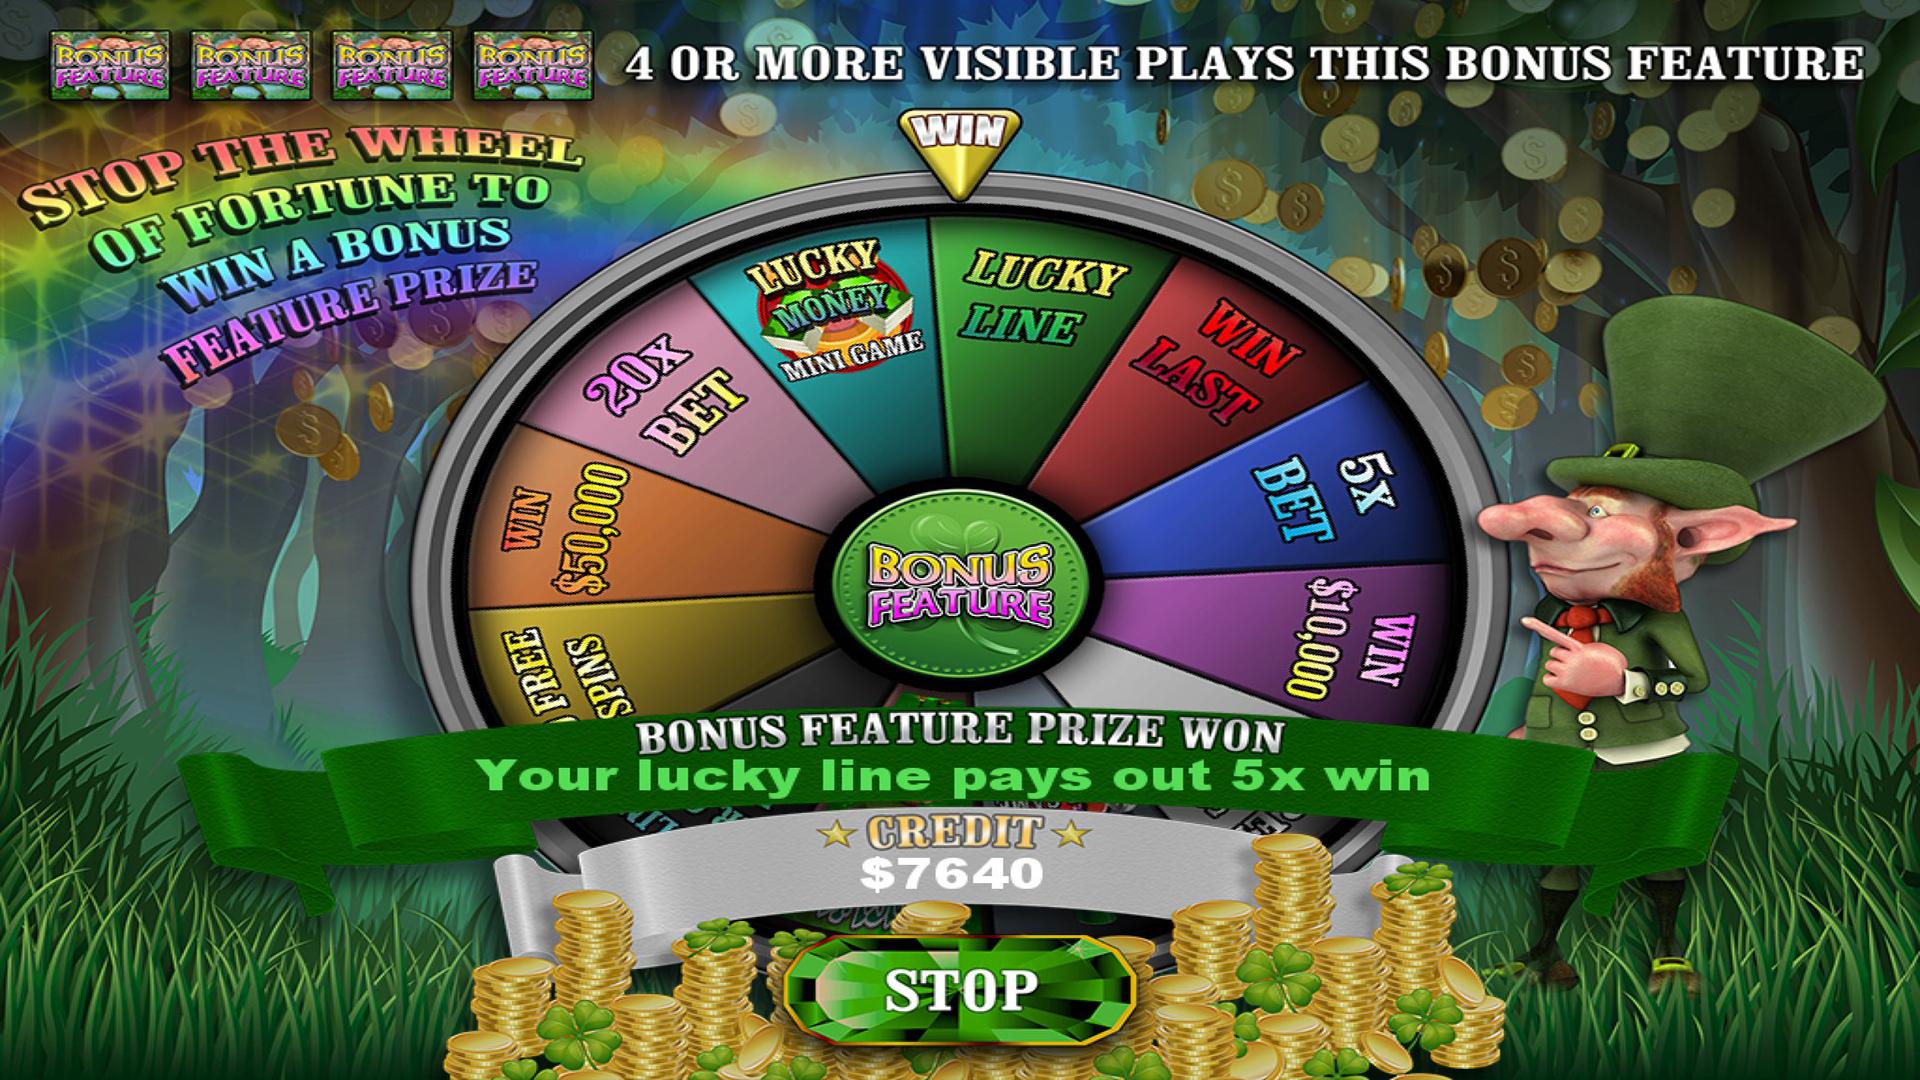 Crock O'Gold Slots 2 - Dublin Yer Cash TV screenshot 2